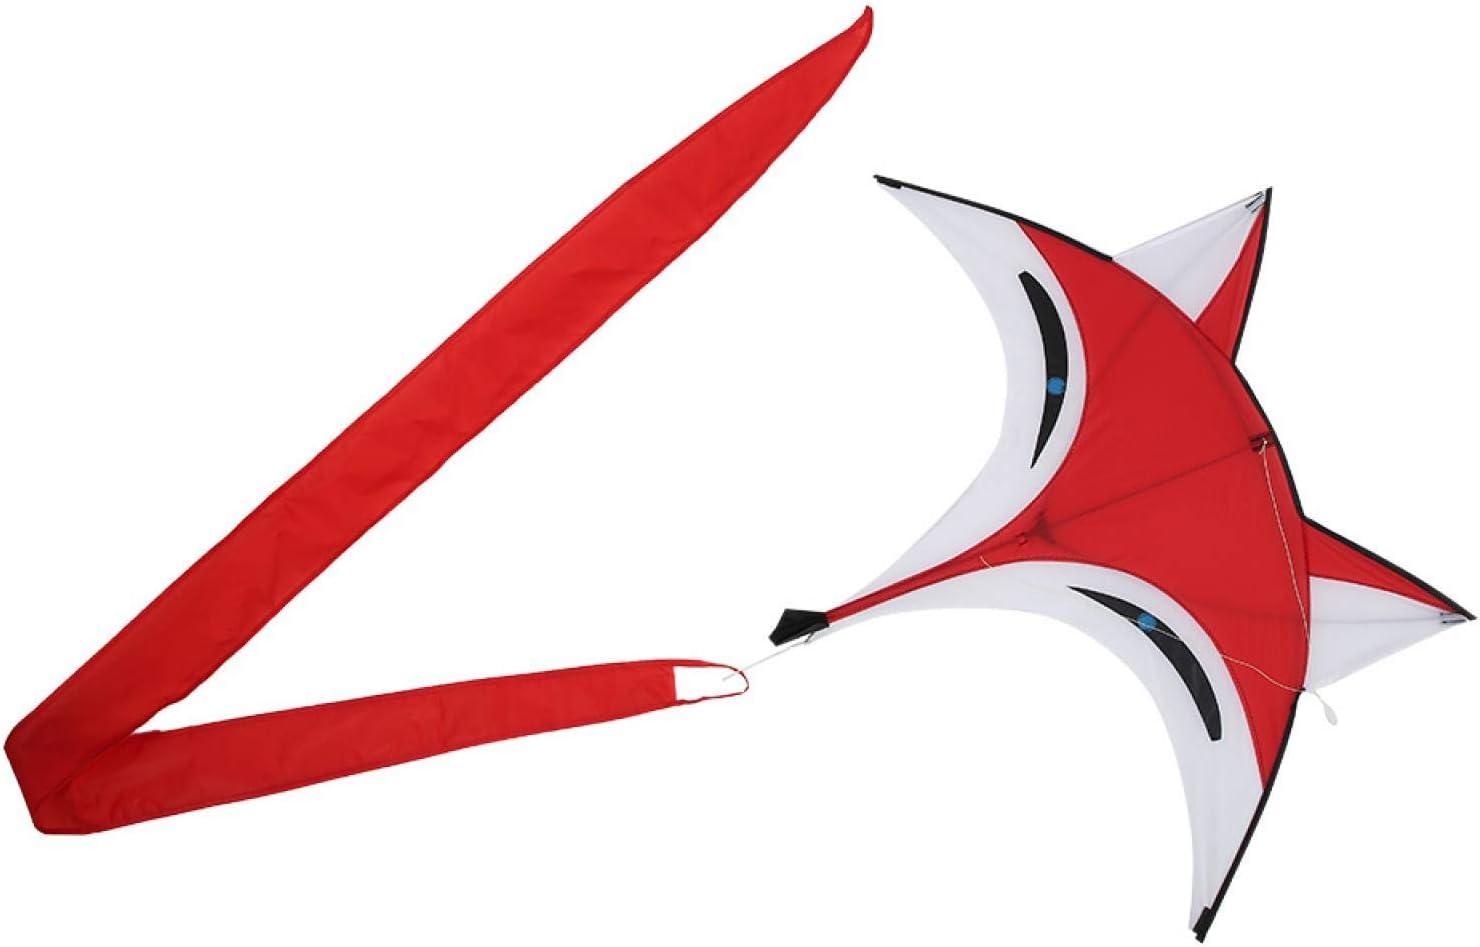 Jopwkuin Children Gift Regular store Ranking TOP5 Cartoon Cute for Beach Outdoor Kite